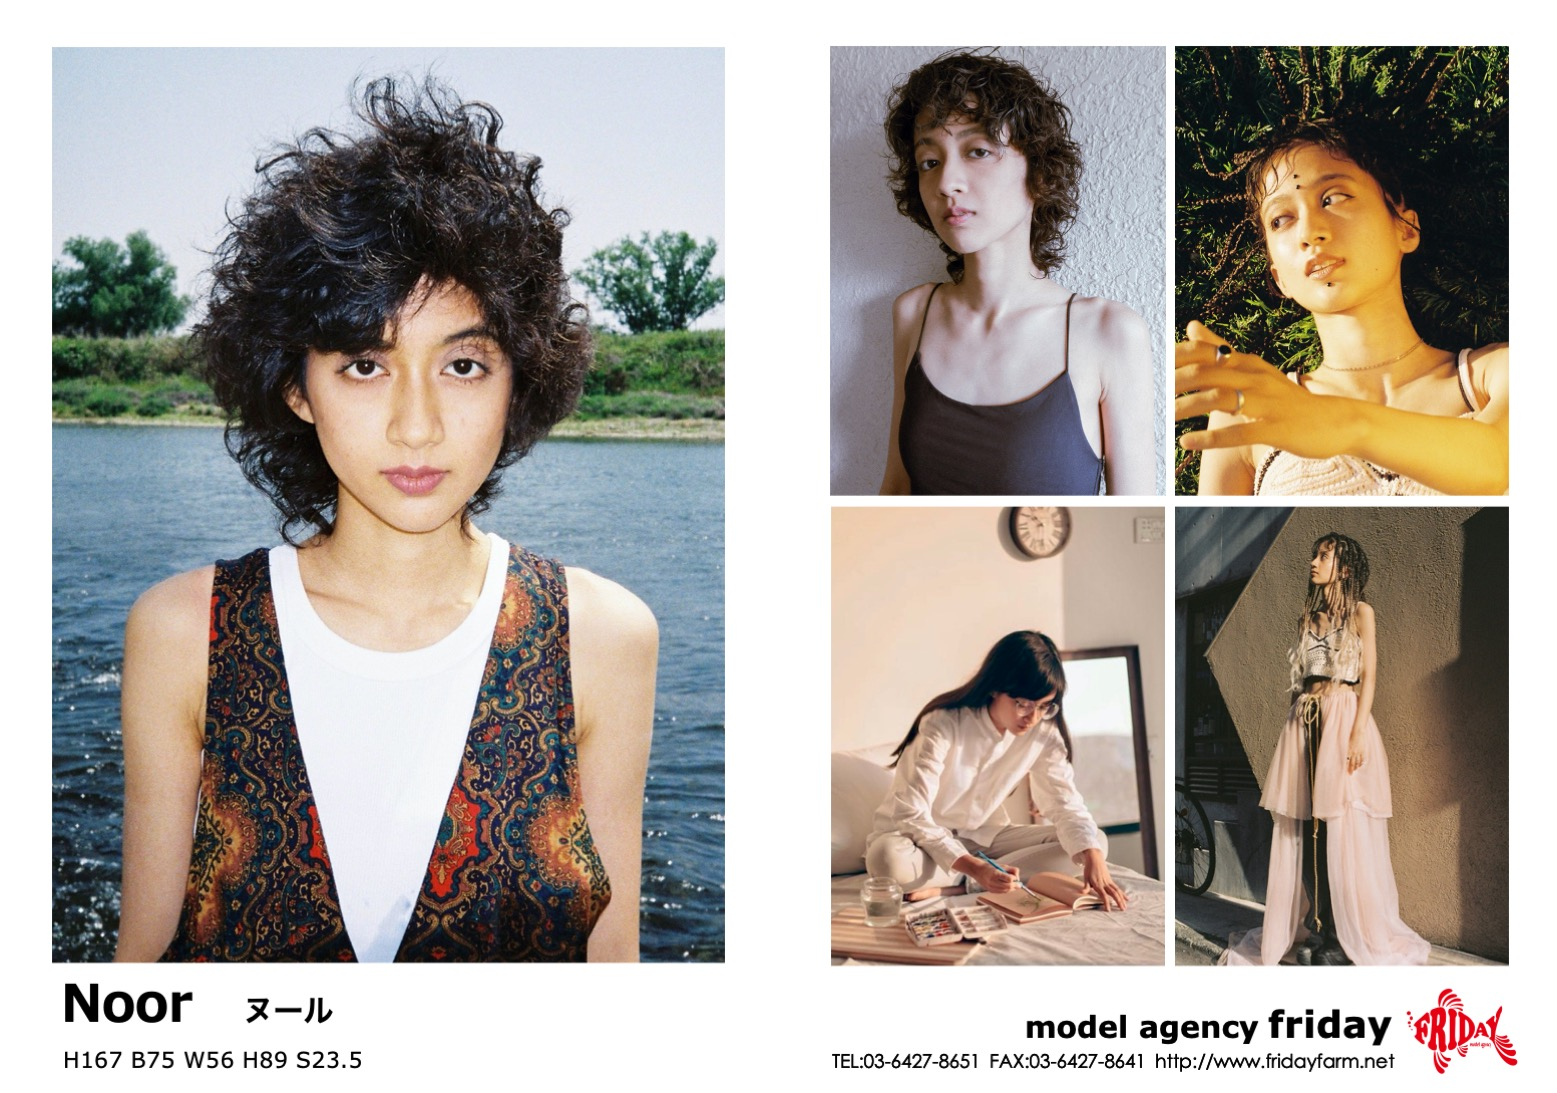 Noor - ヌール | model agency friday